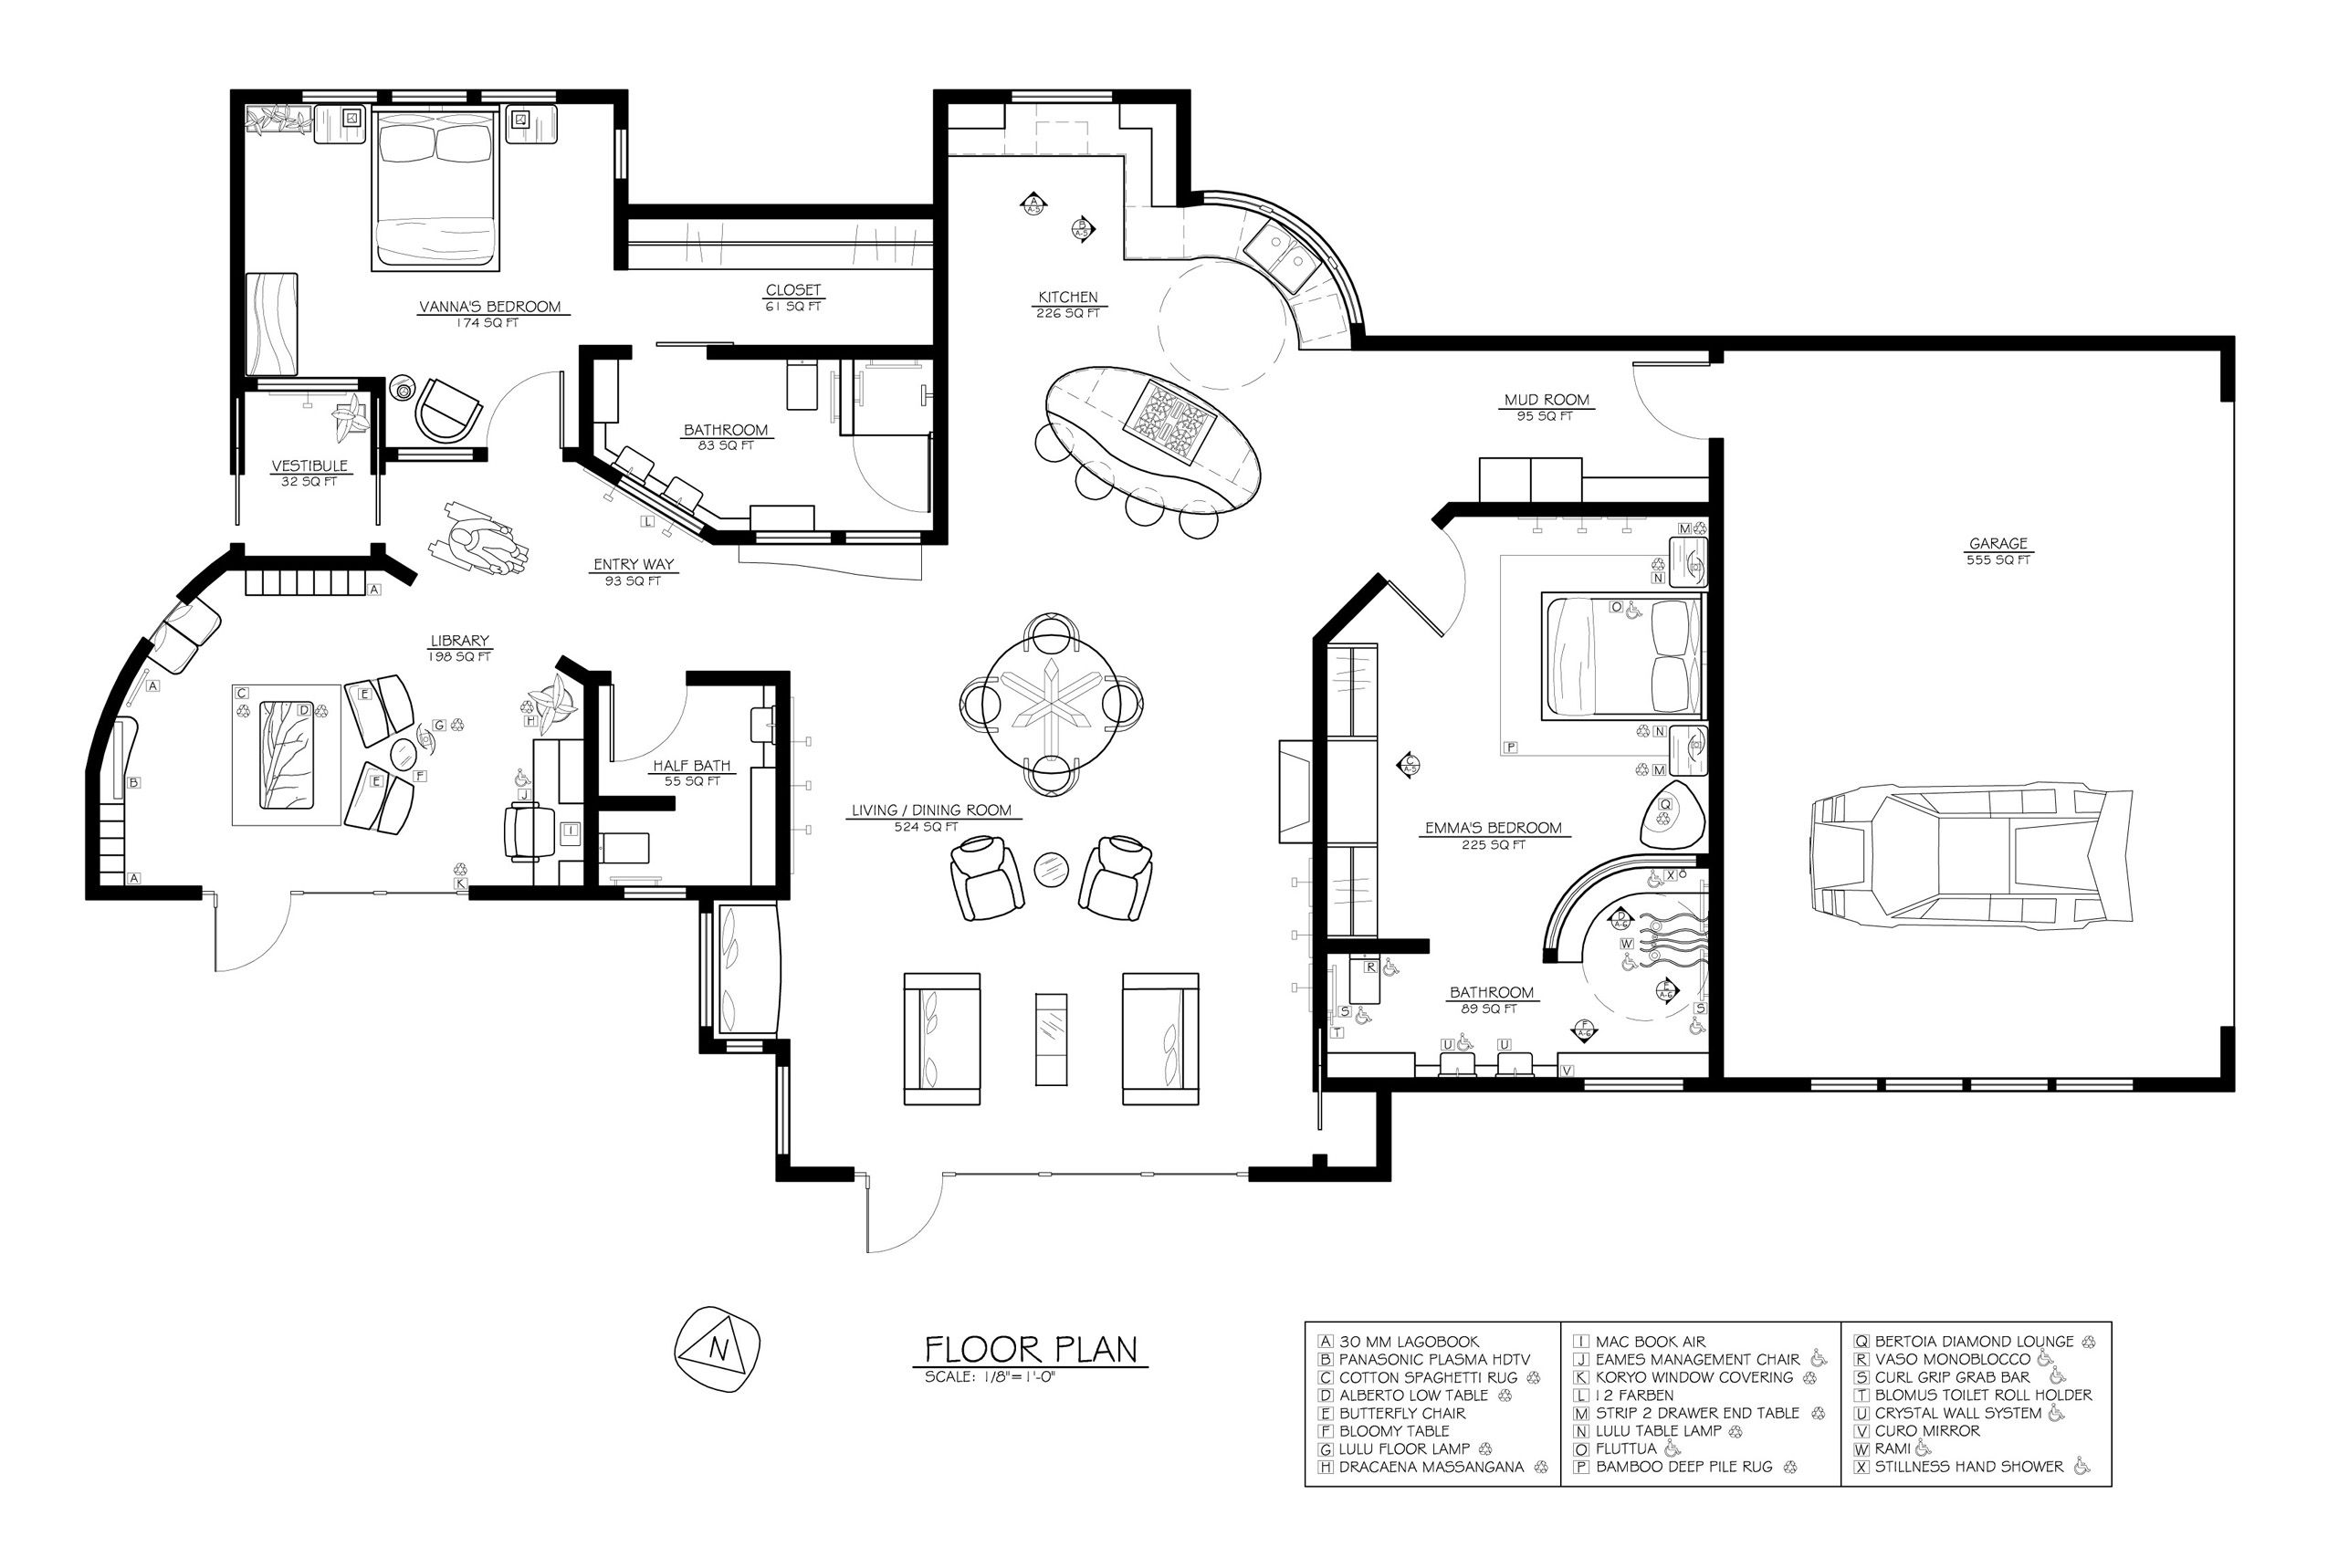 Passive Solar Floor Plan Jpg 2550 1718 Passive Solar House Plans Solar House Plans Bathroom Floor Plans